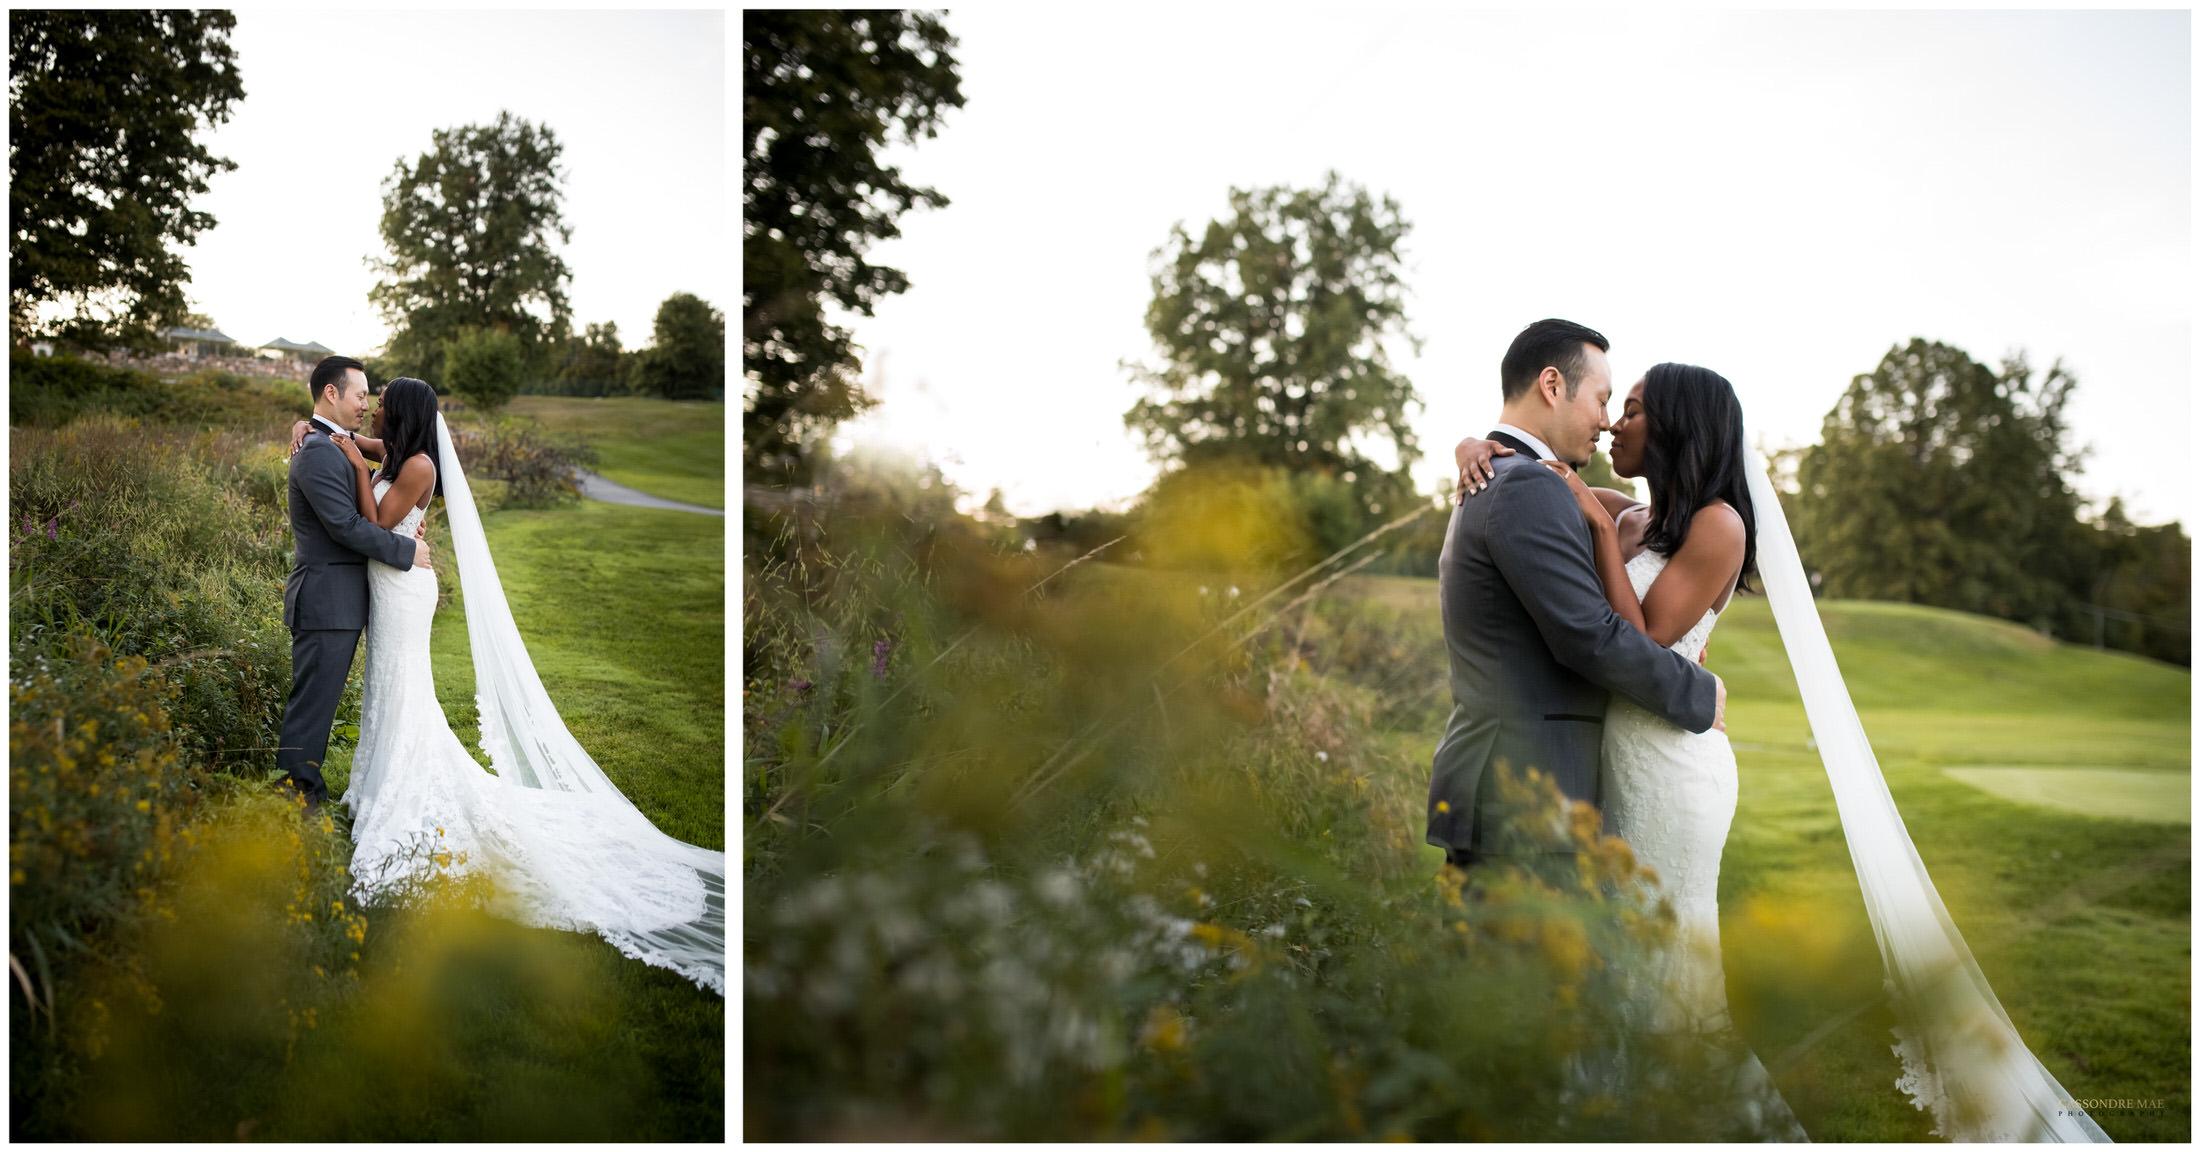 West Hills Country Club Wedding Photos Cassondre Mae Photography 19.jpg